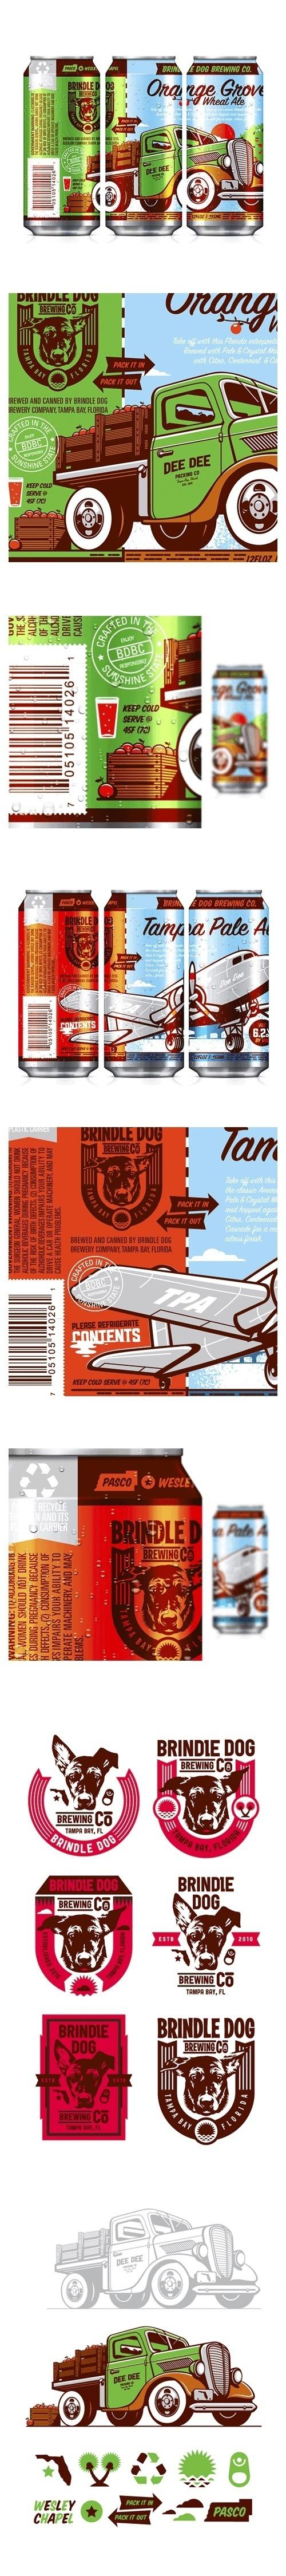 Brindle Dog Brewing Co. #beer #packaging #florida #illustration #cans